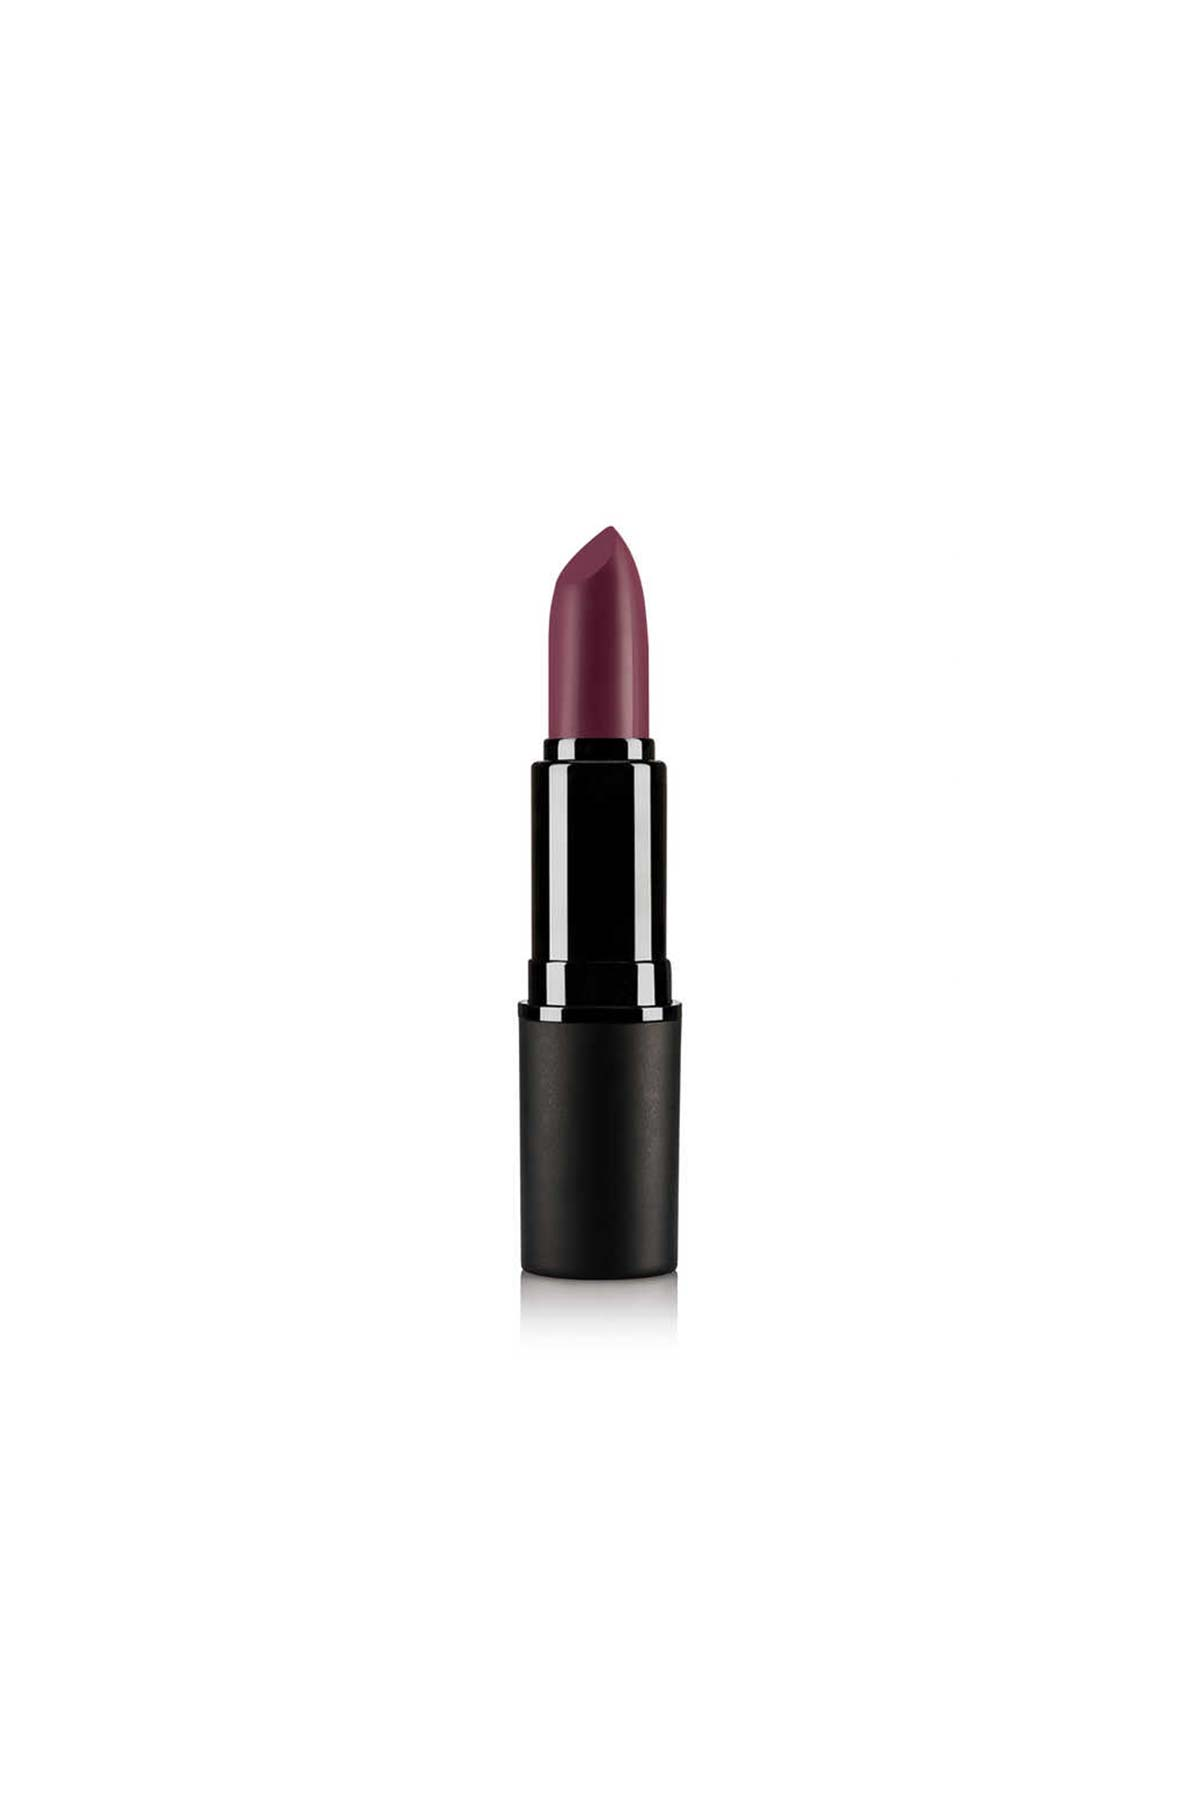 Matte Lipstick - 177 -Ruj - Lipstick Thumbnail